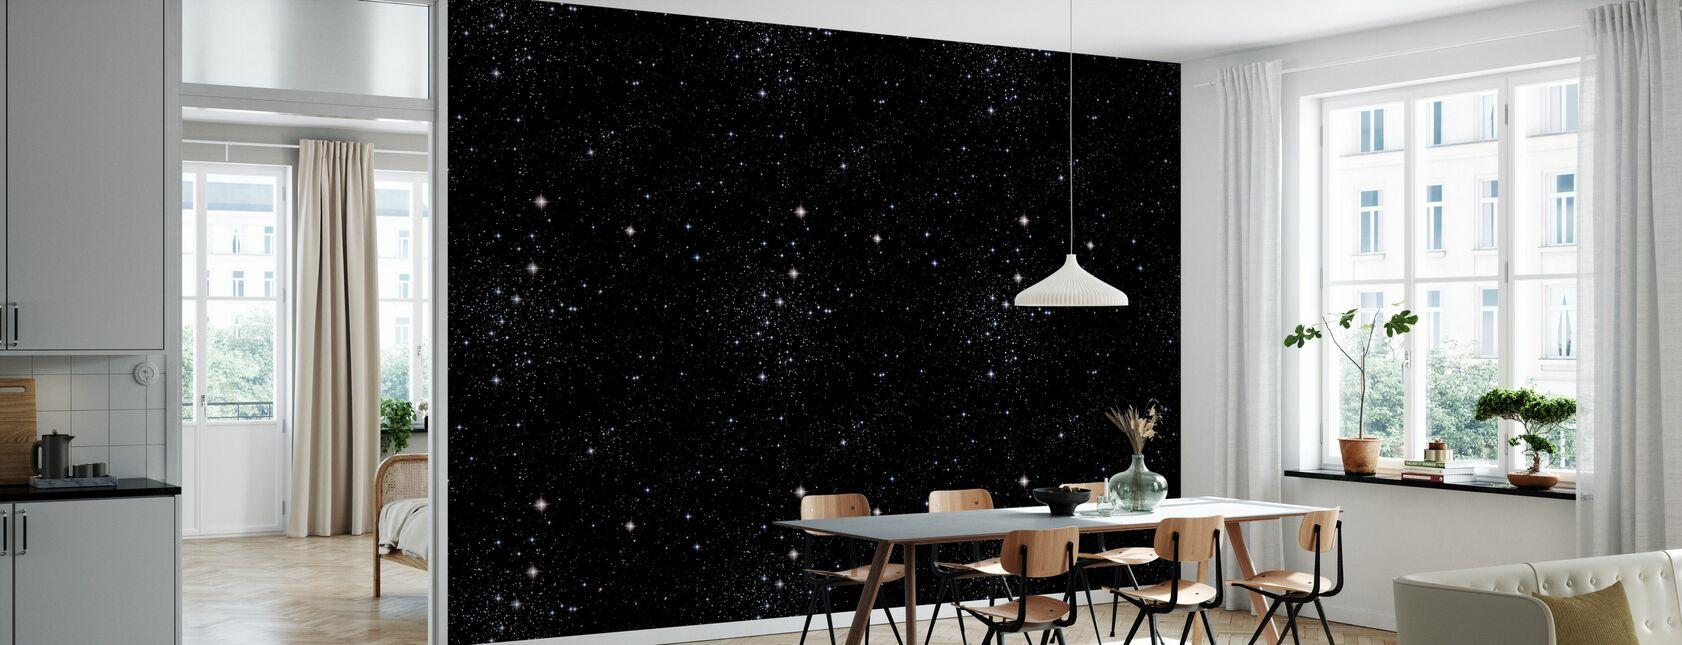 Star Night - Wallpaper - Kitchen